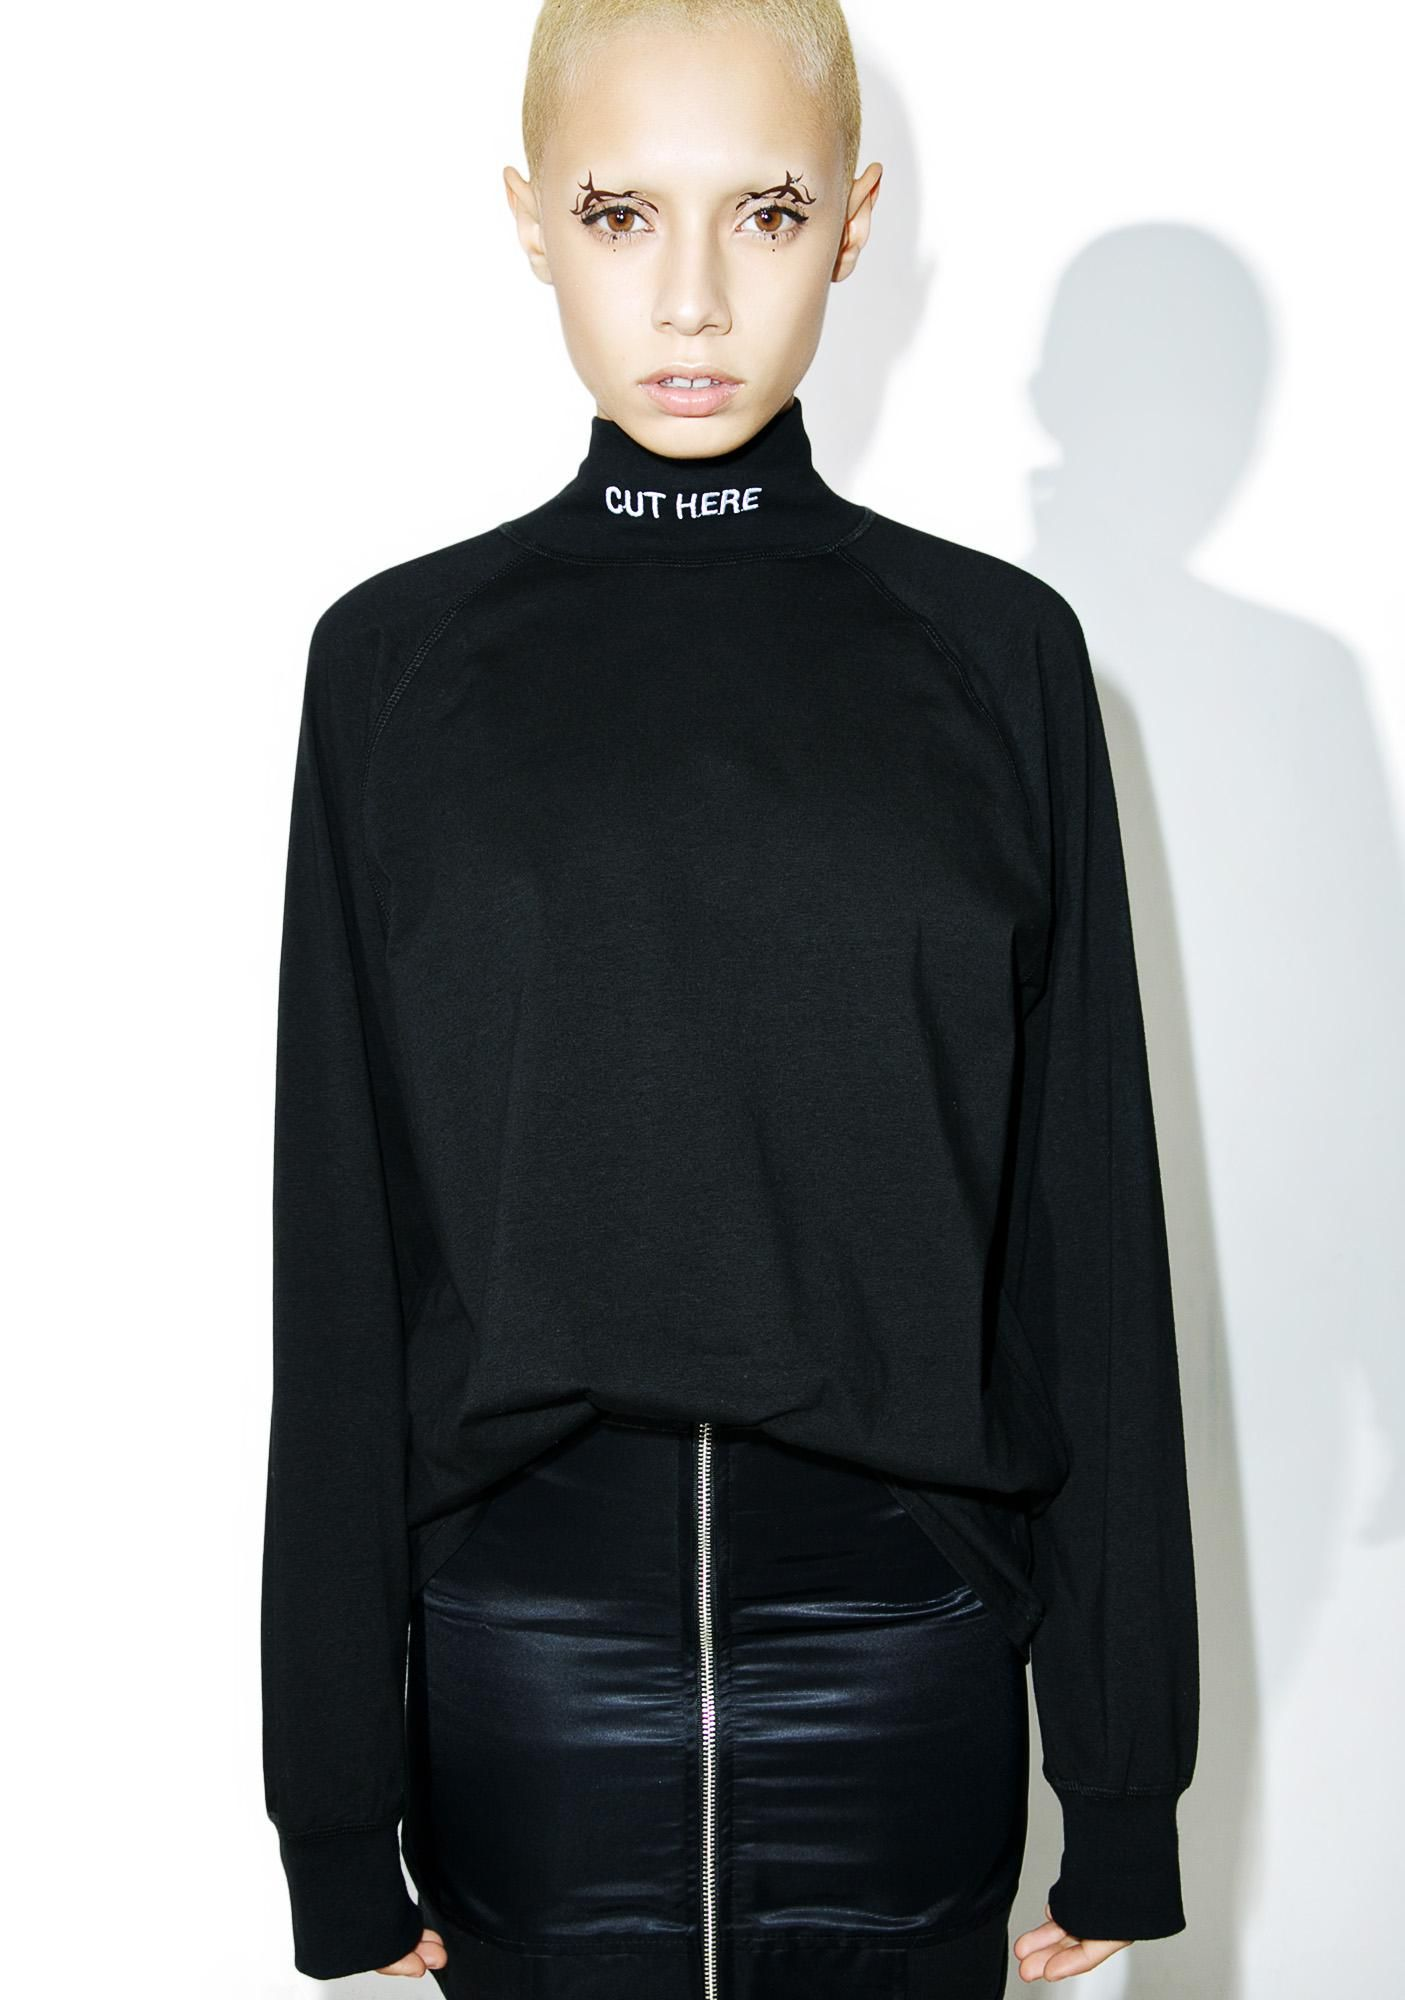 Leather jacket aesthetic - Cut Here Mock Turtleneck